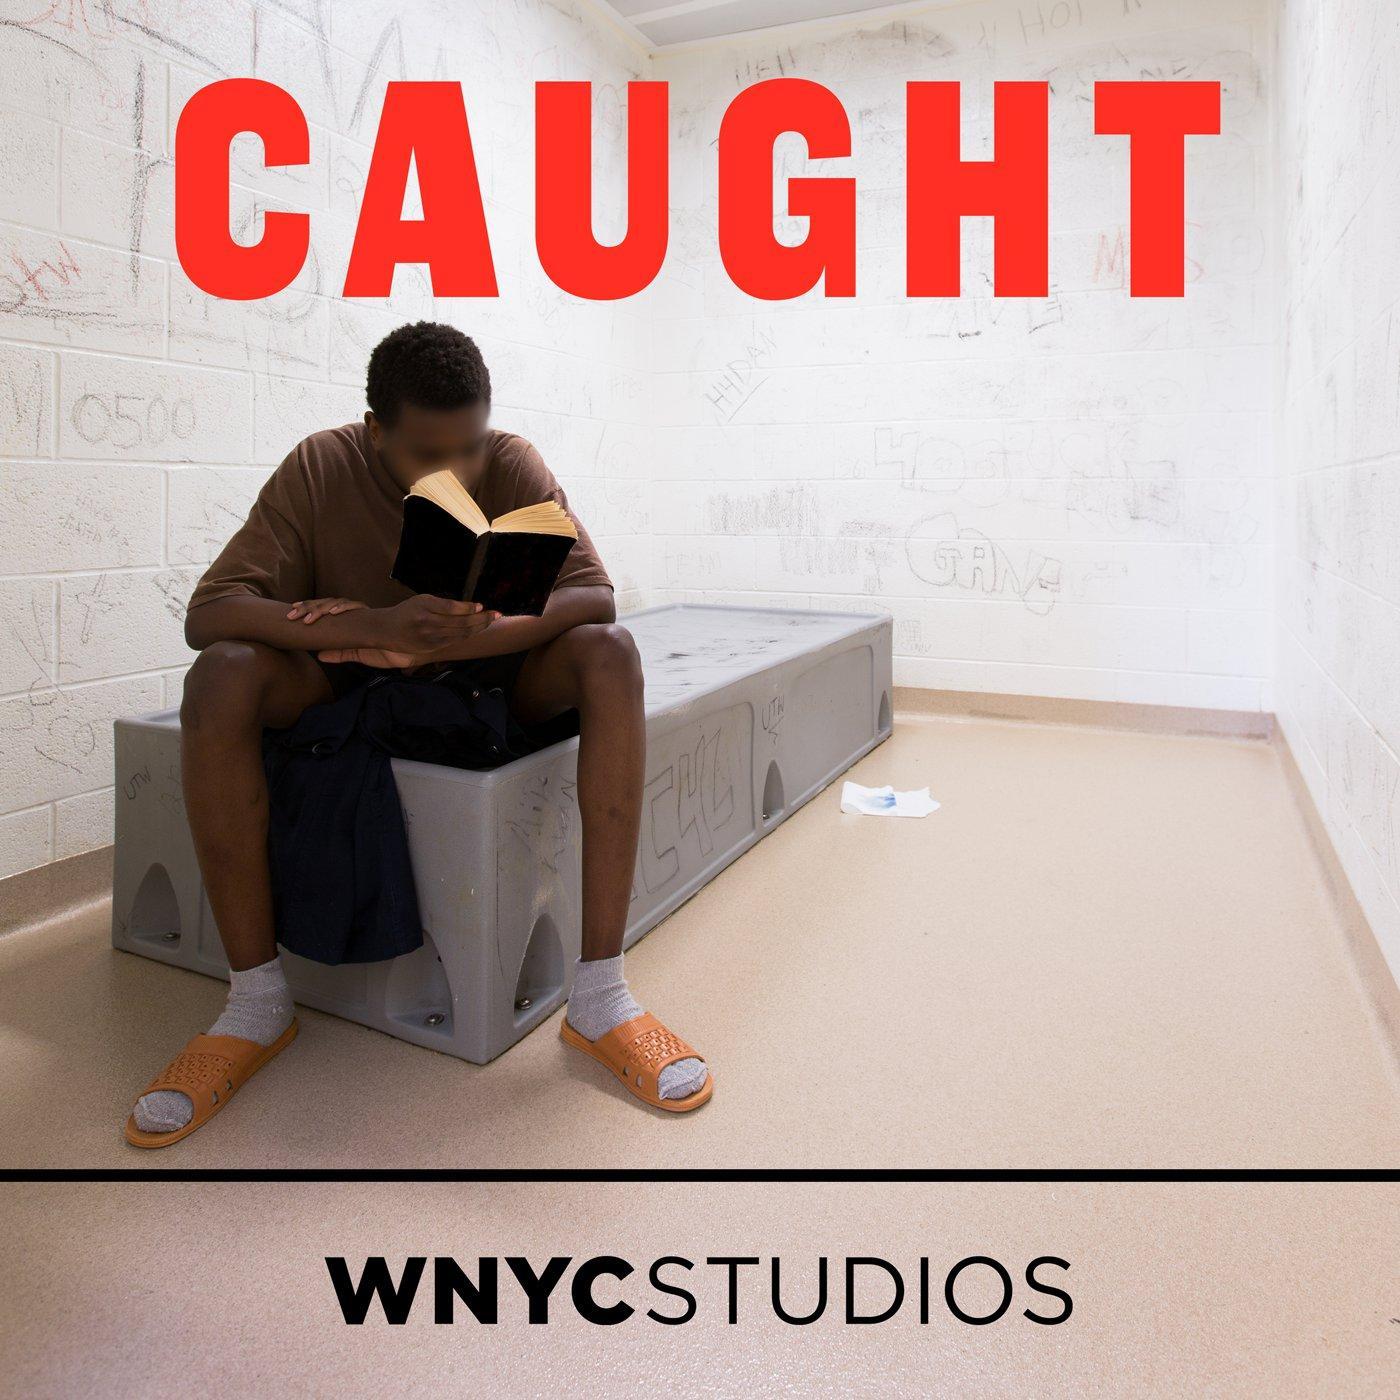 Caught: Episodes | WNYC Studios | Podcasts